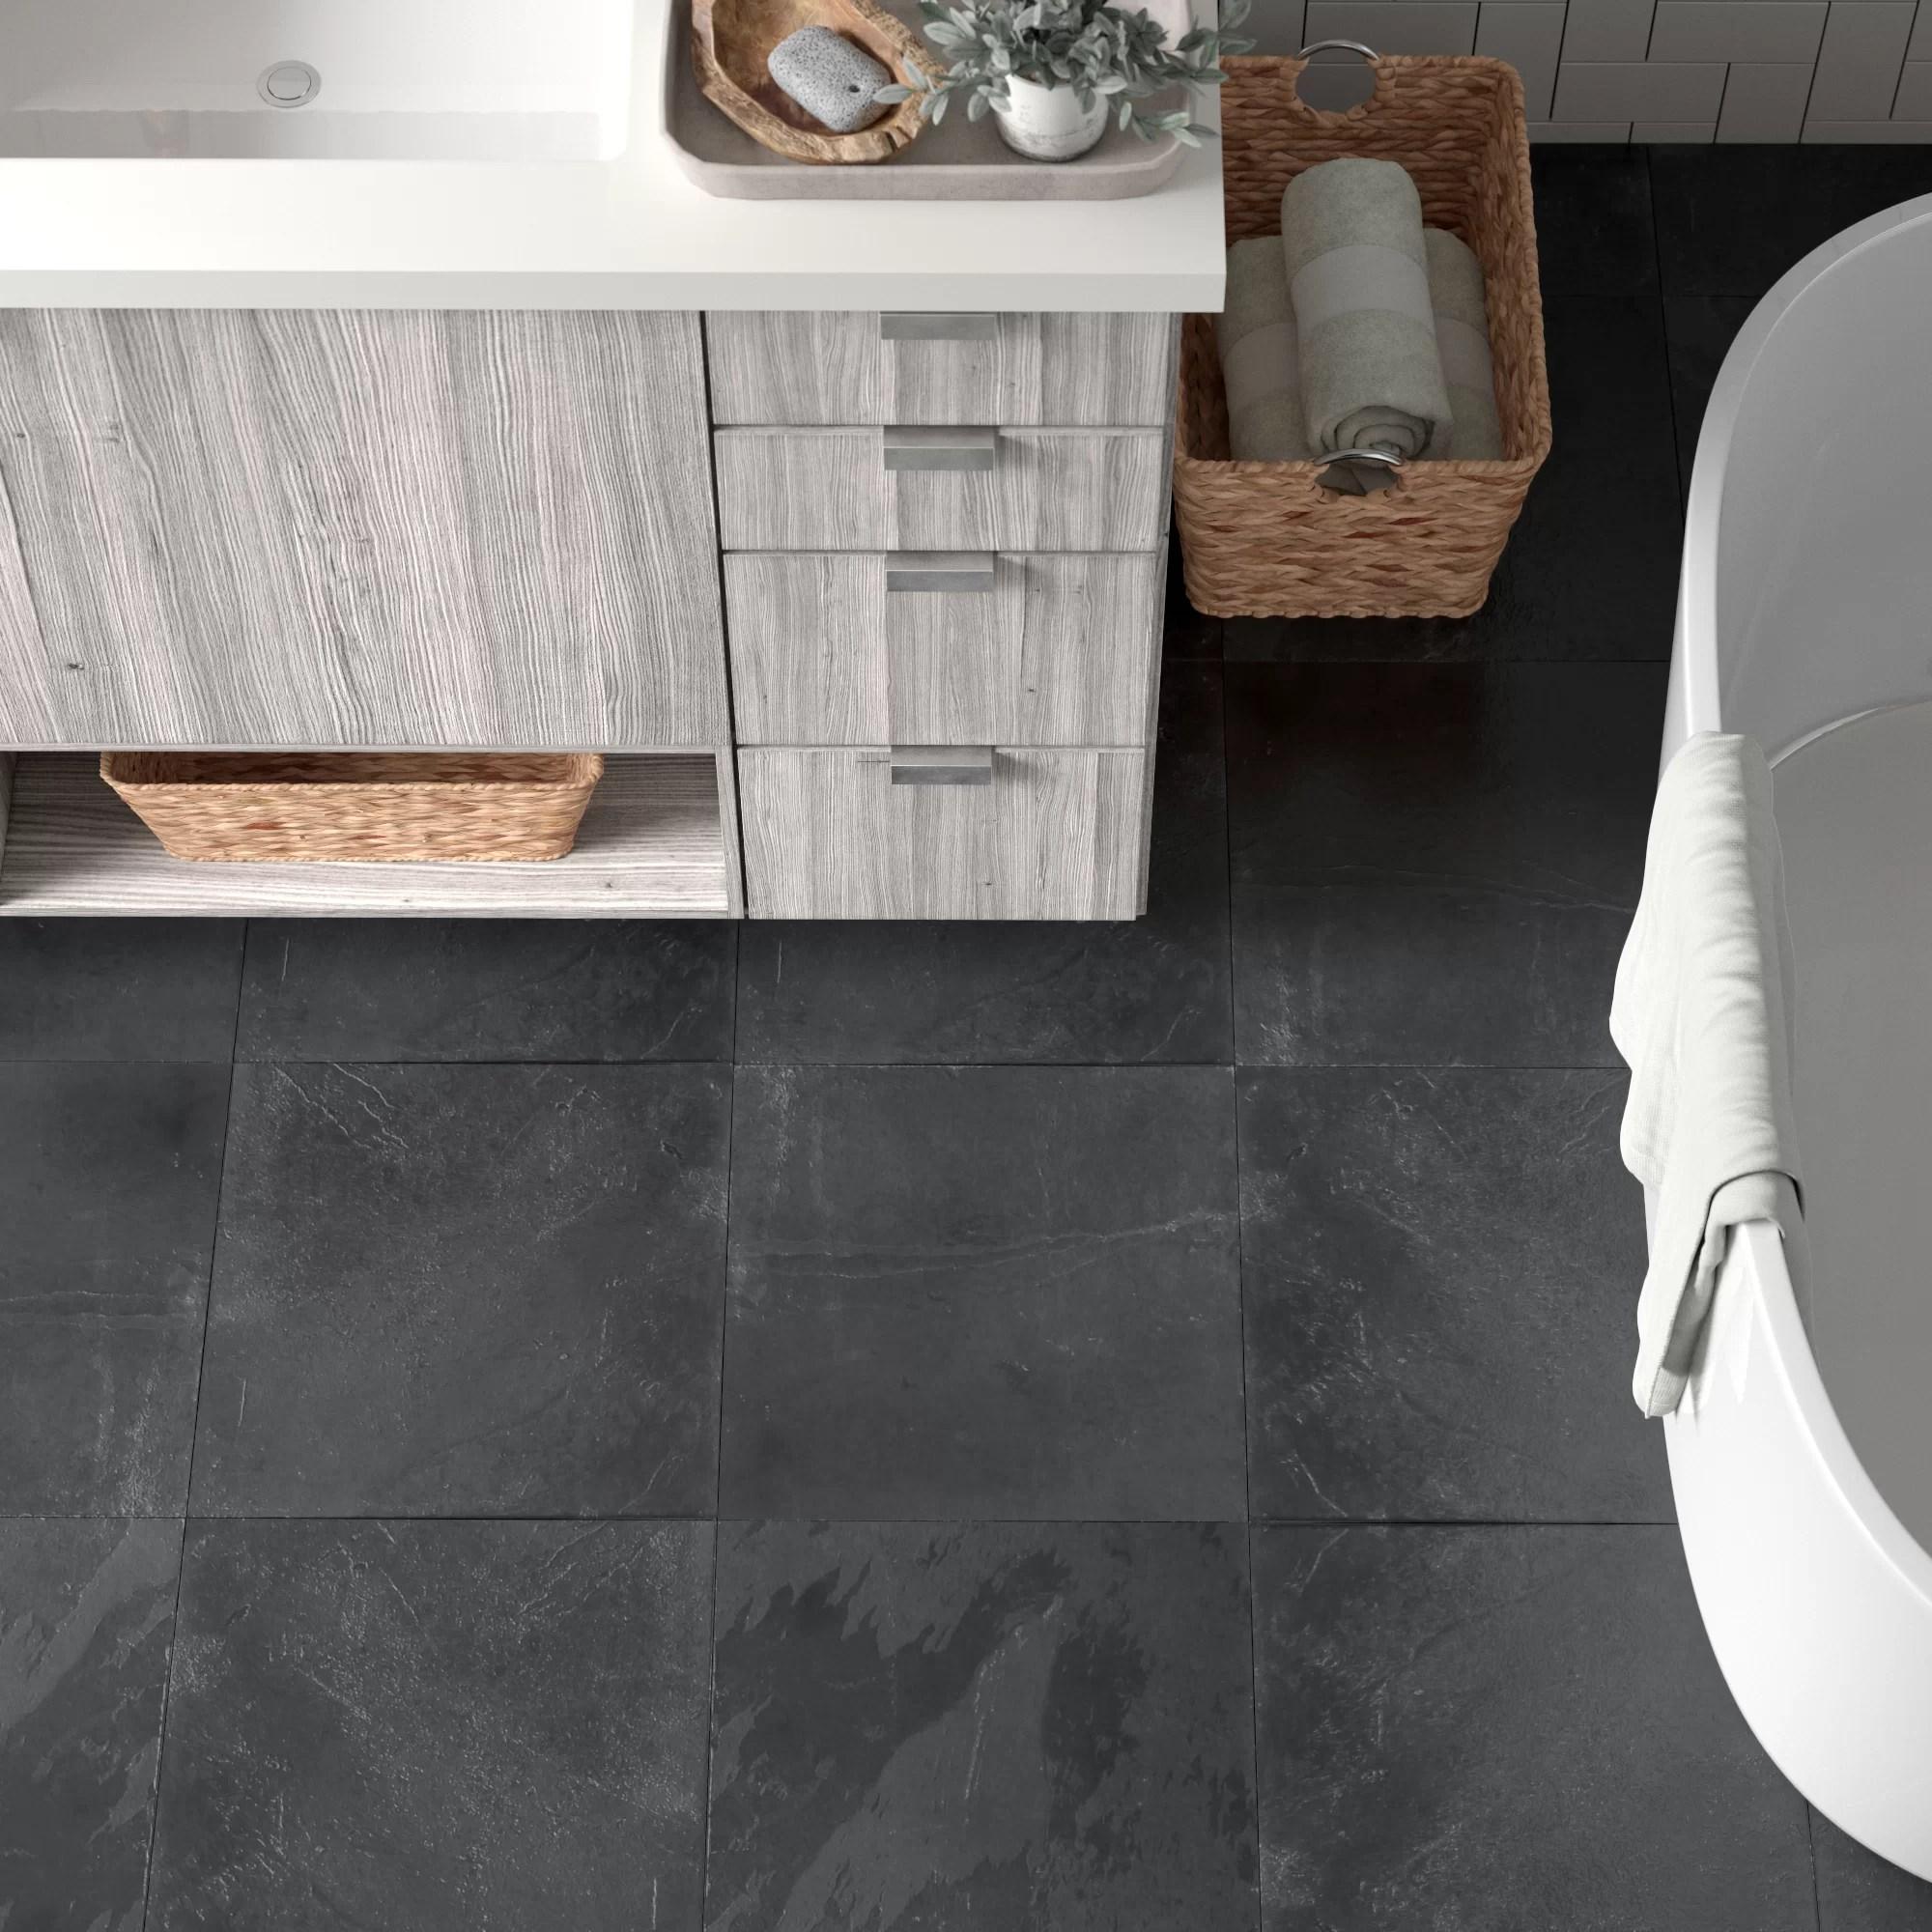 16 x 16 floor tiles wall tiles free